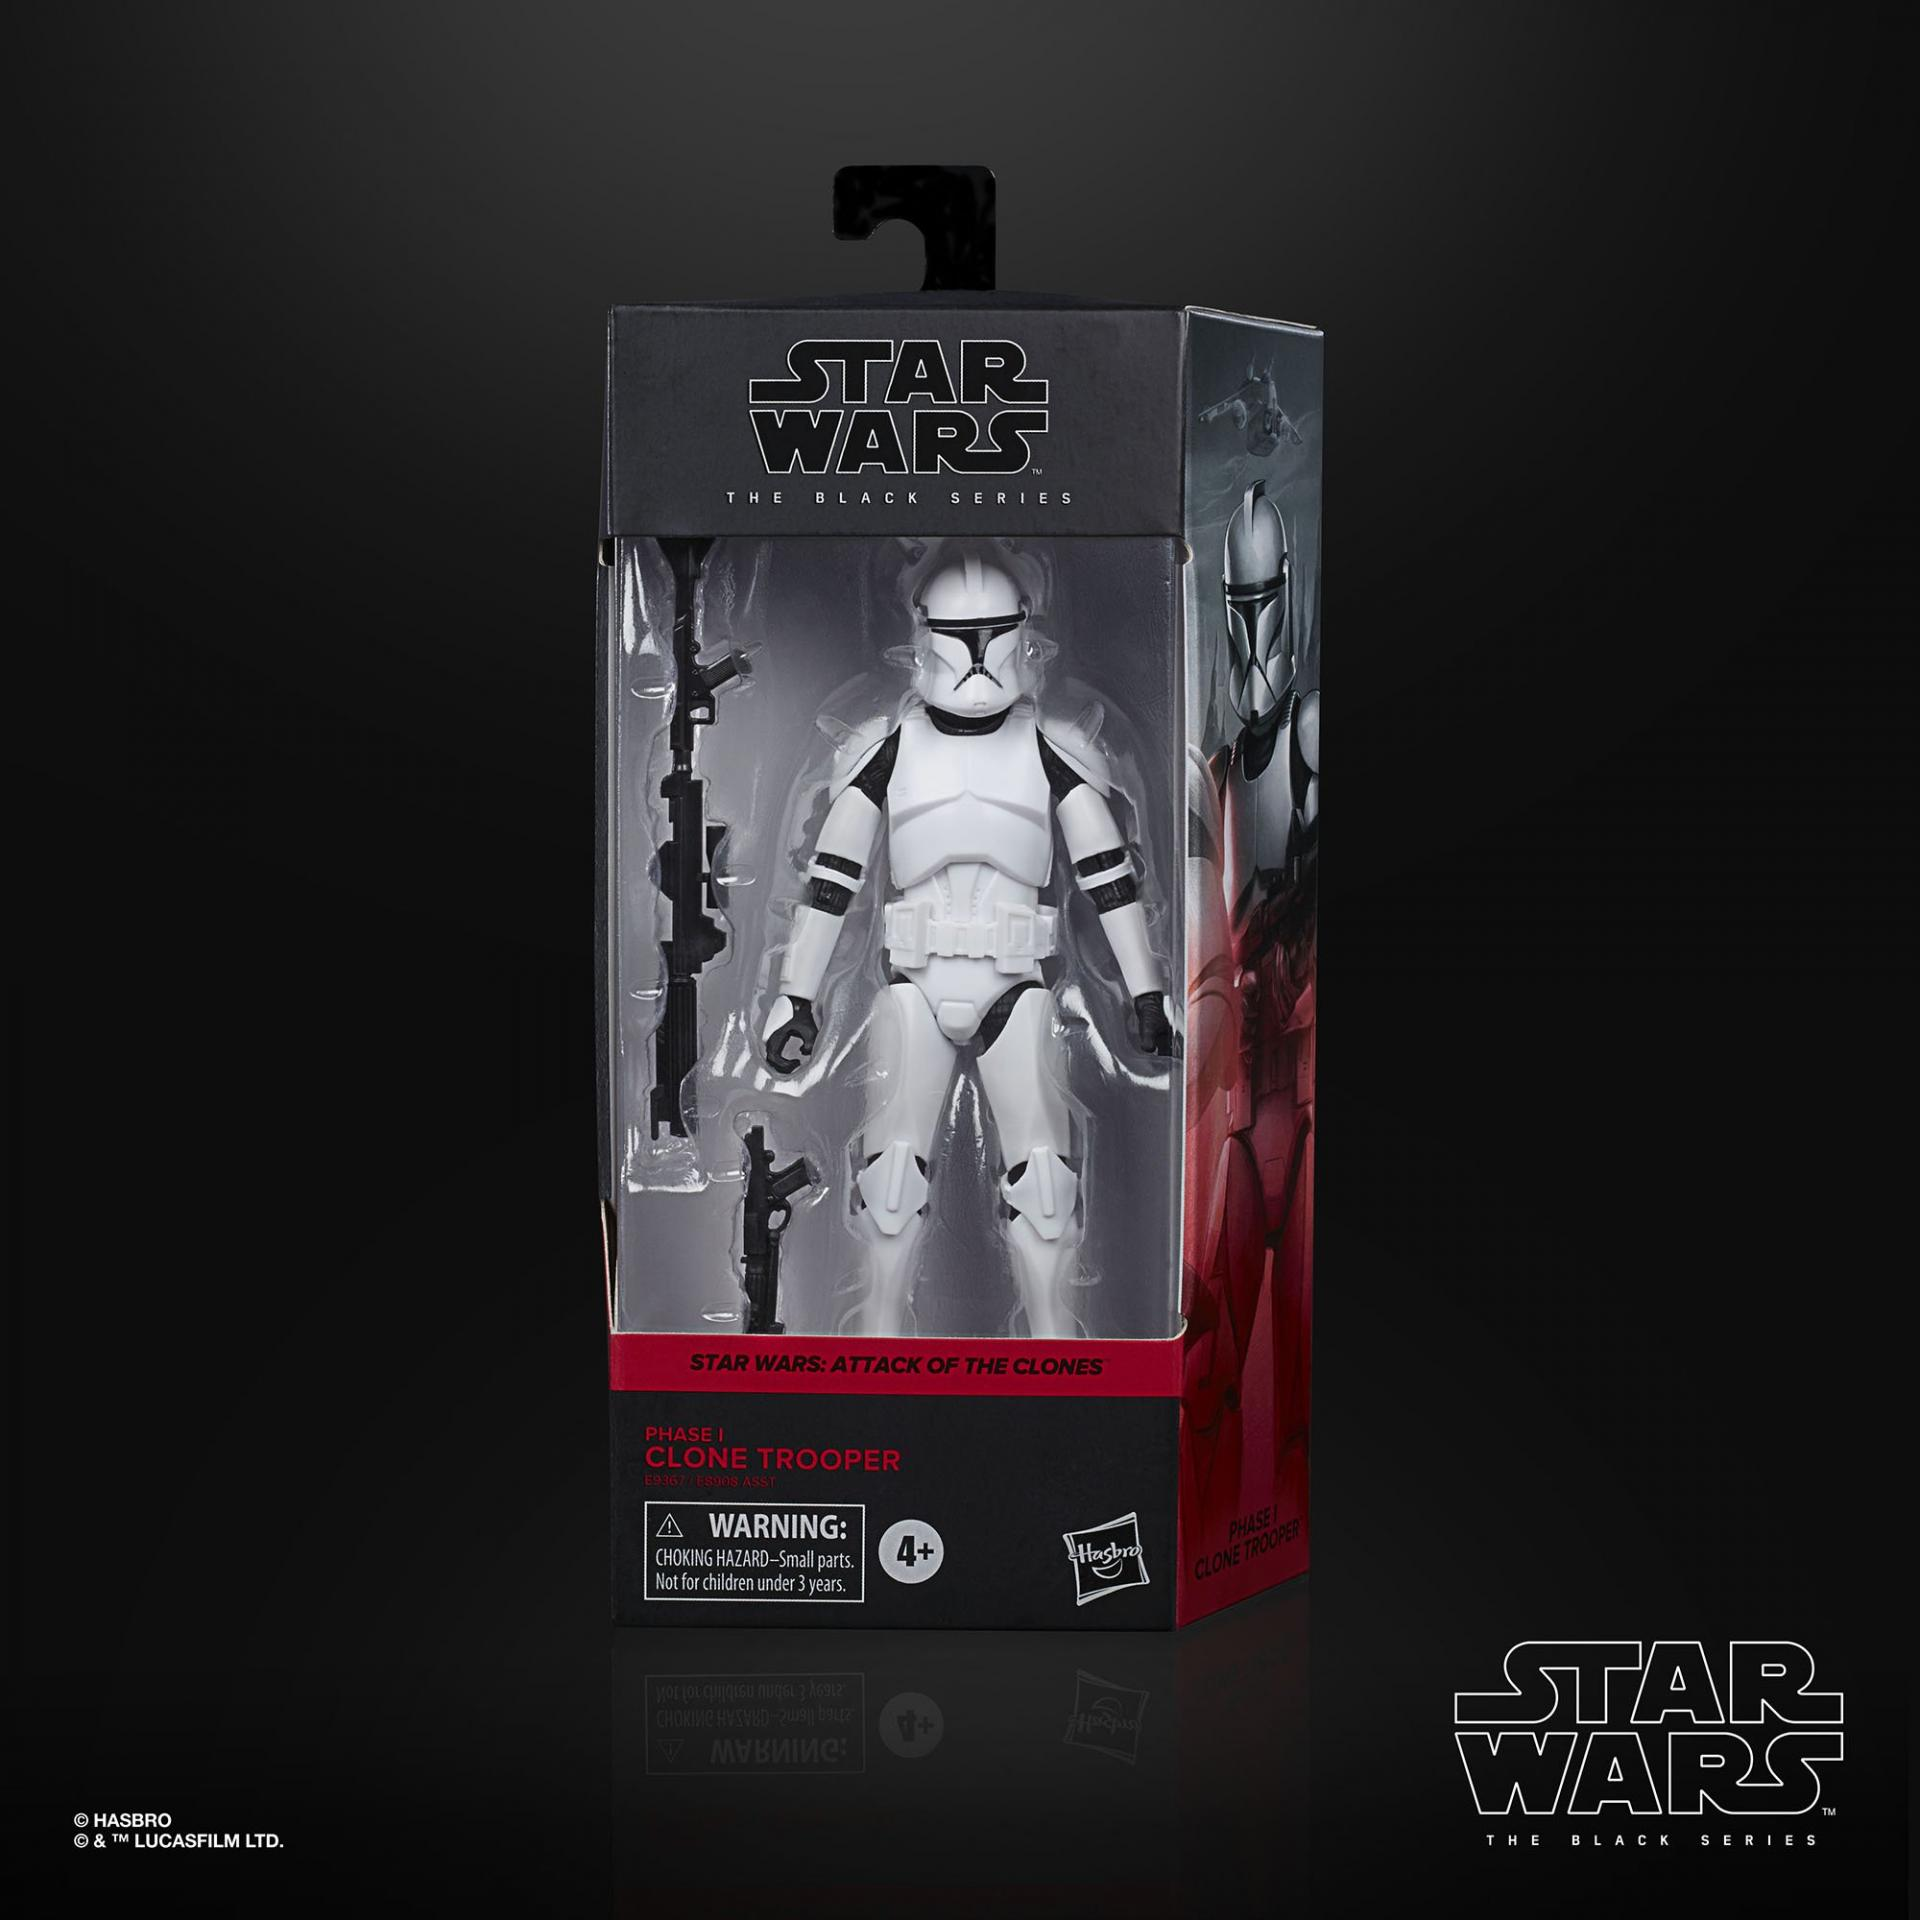 Star wars the black series phase i clone trooper 15cm